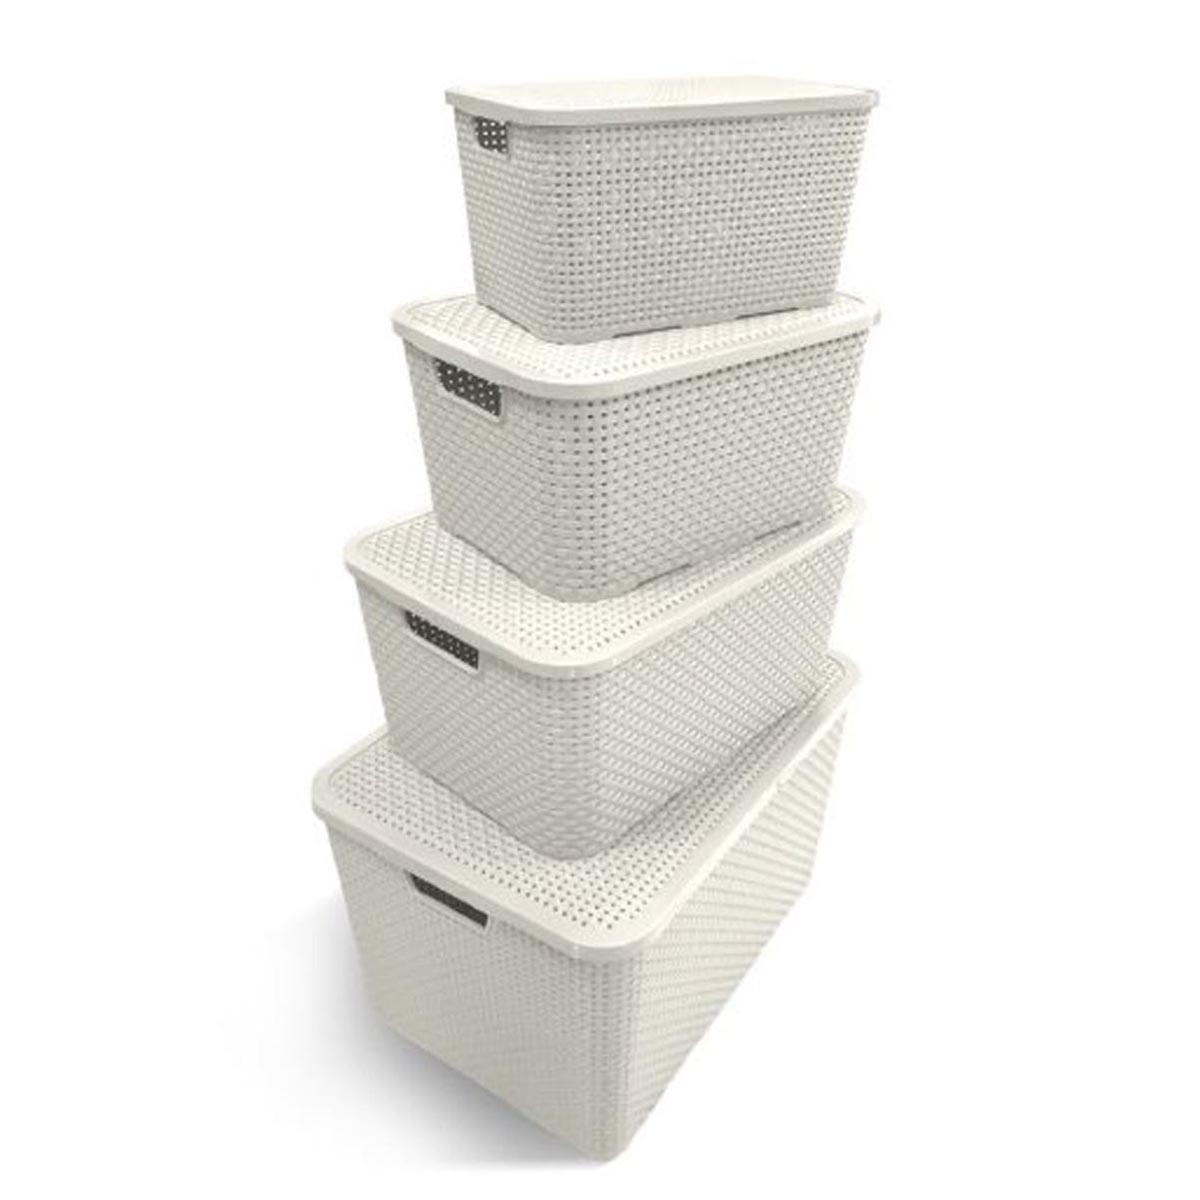 Caixa Organizadora Plástica Cesto Rattan 40 Litros Branca Com Tampa